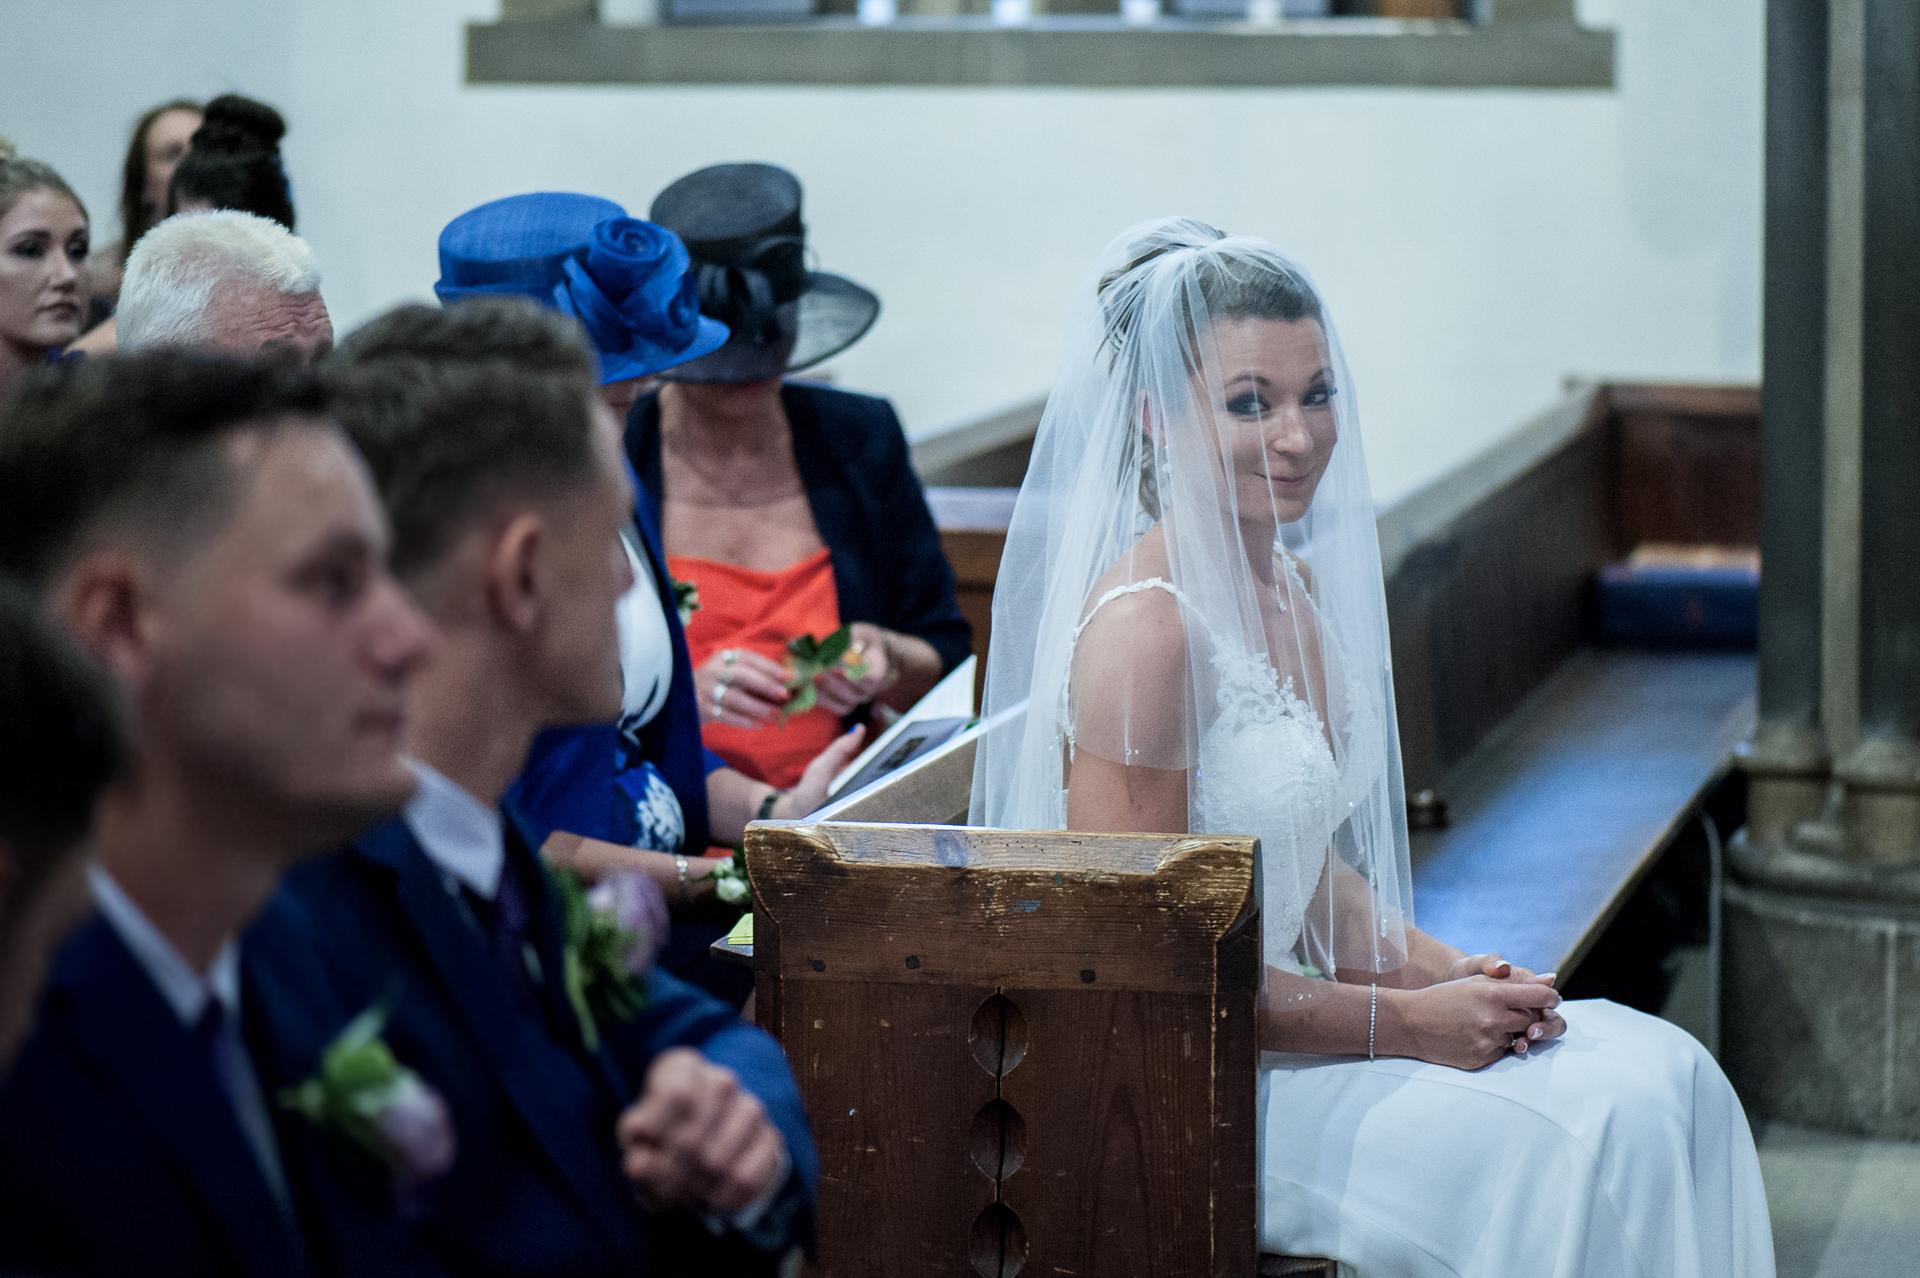 Ufton Court Wedding Photography07.JPG